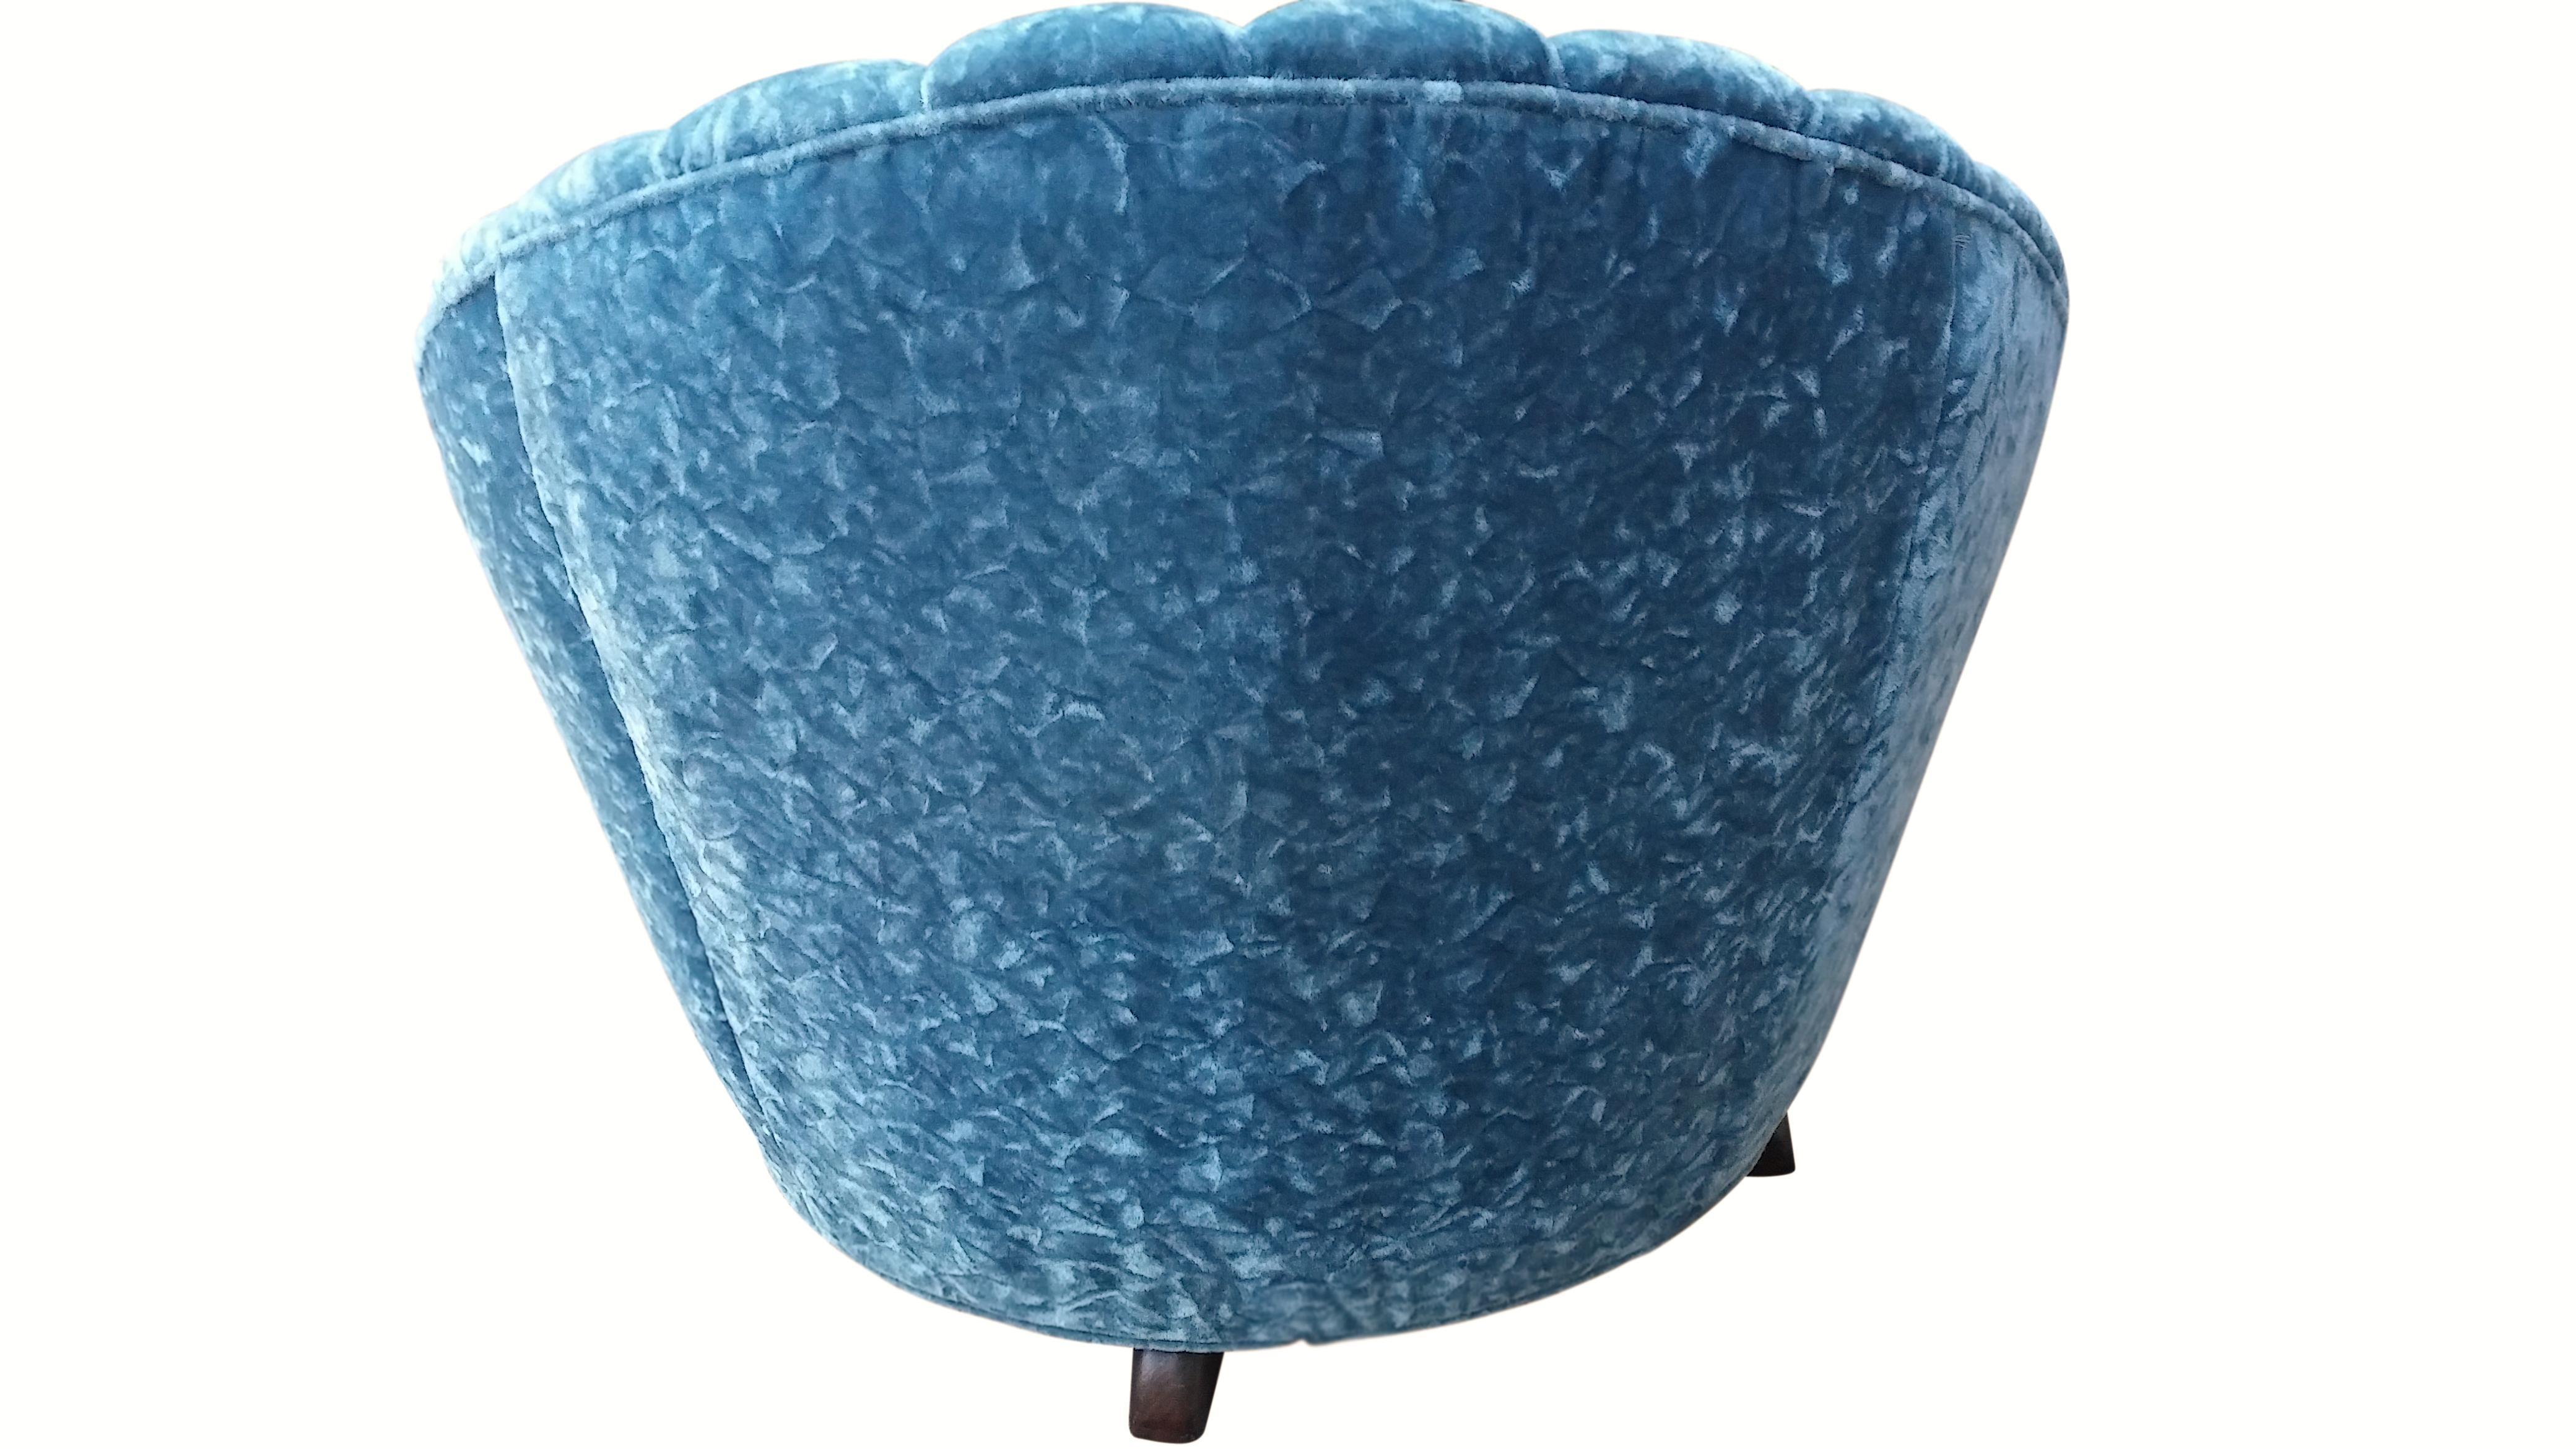 Scalloped Swivel Chair in Dark Teal  Chairish